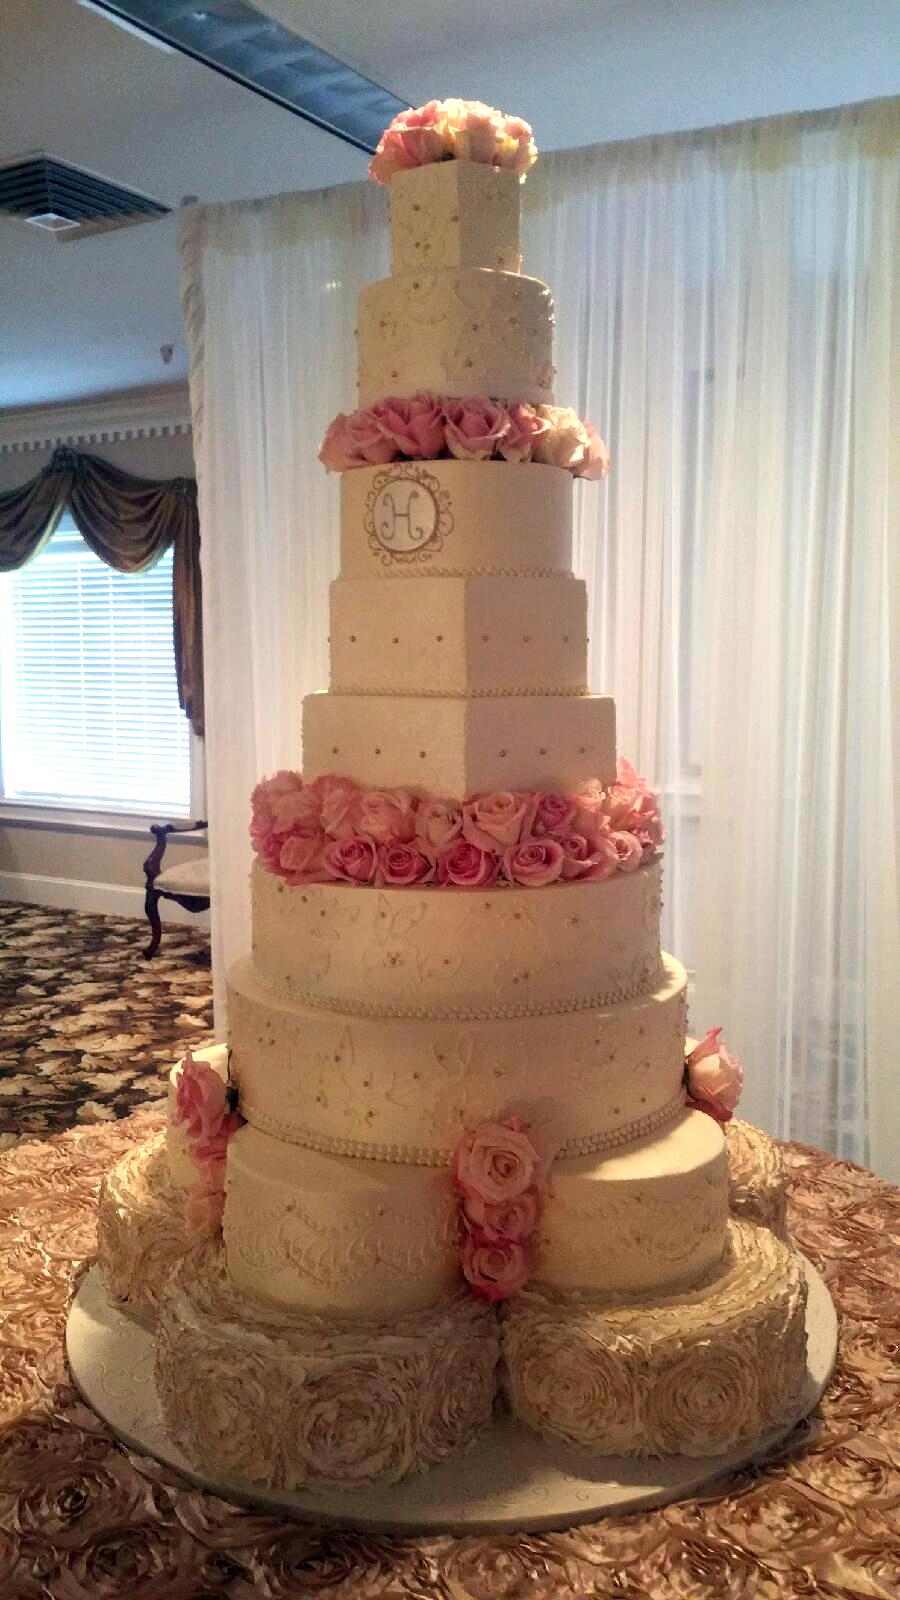 cakesgina - cakes - weddings in houston